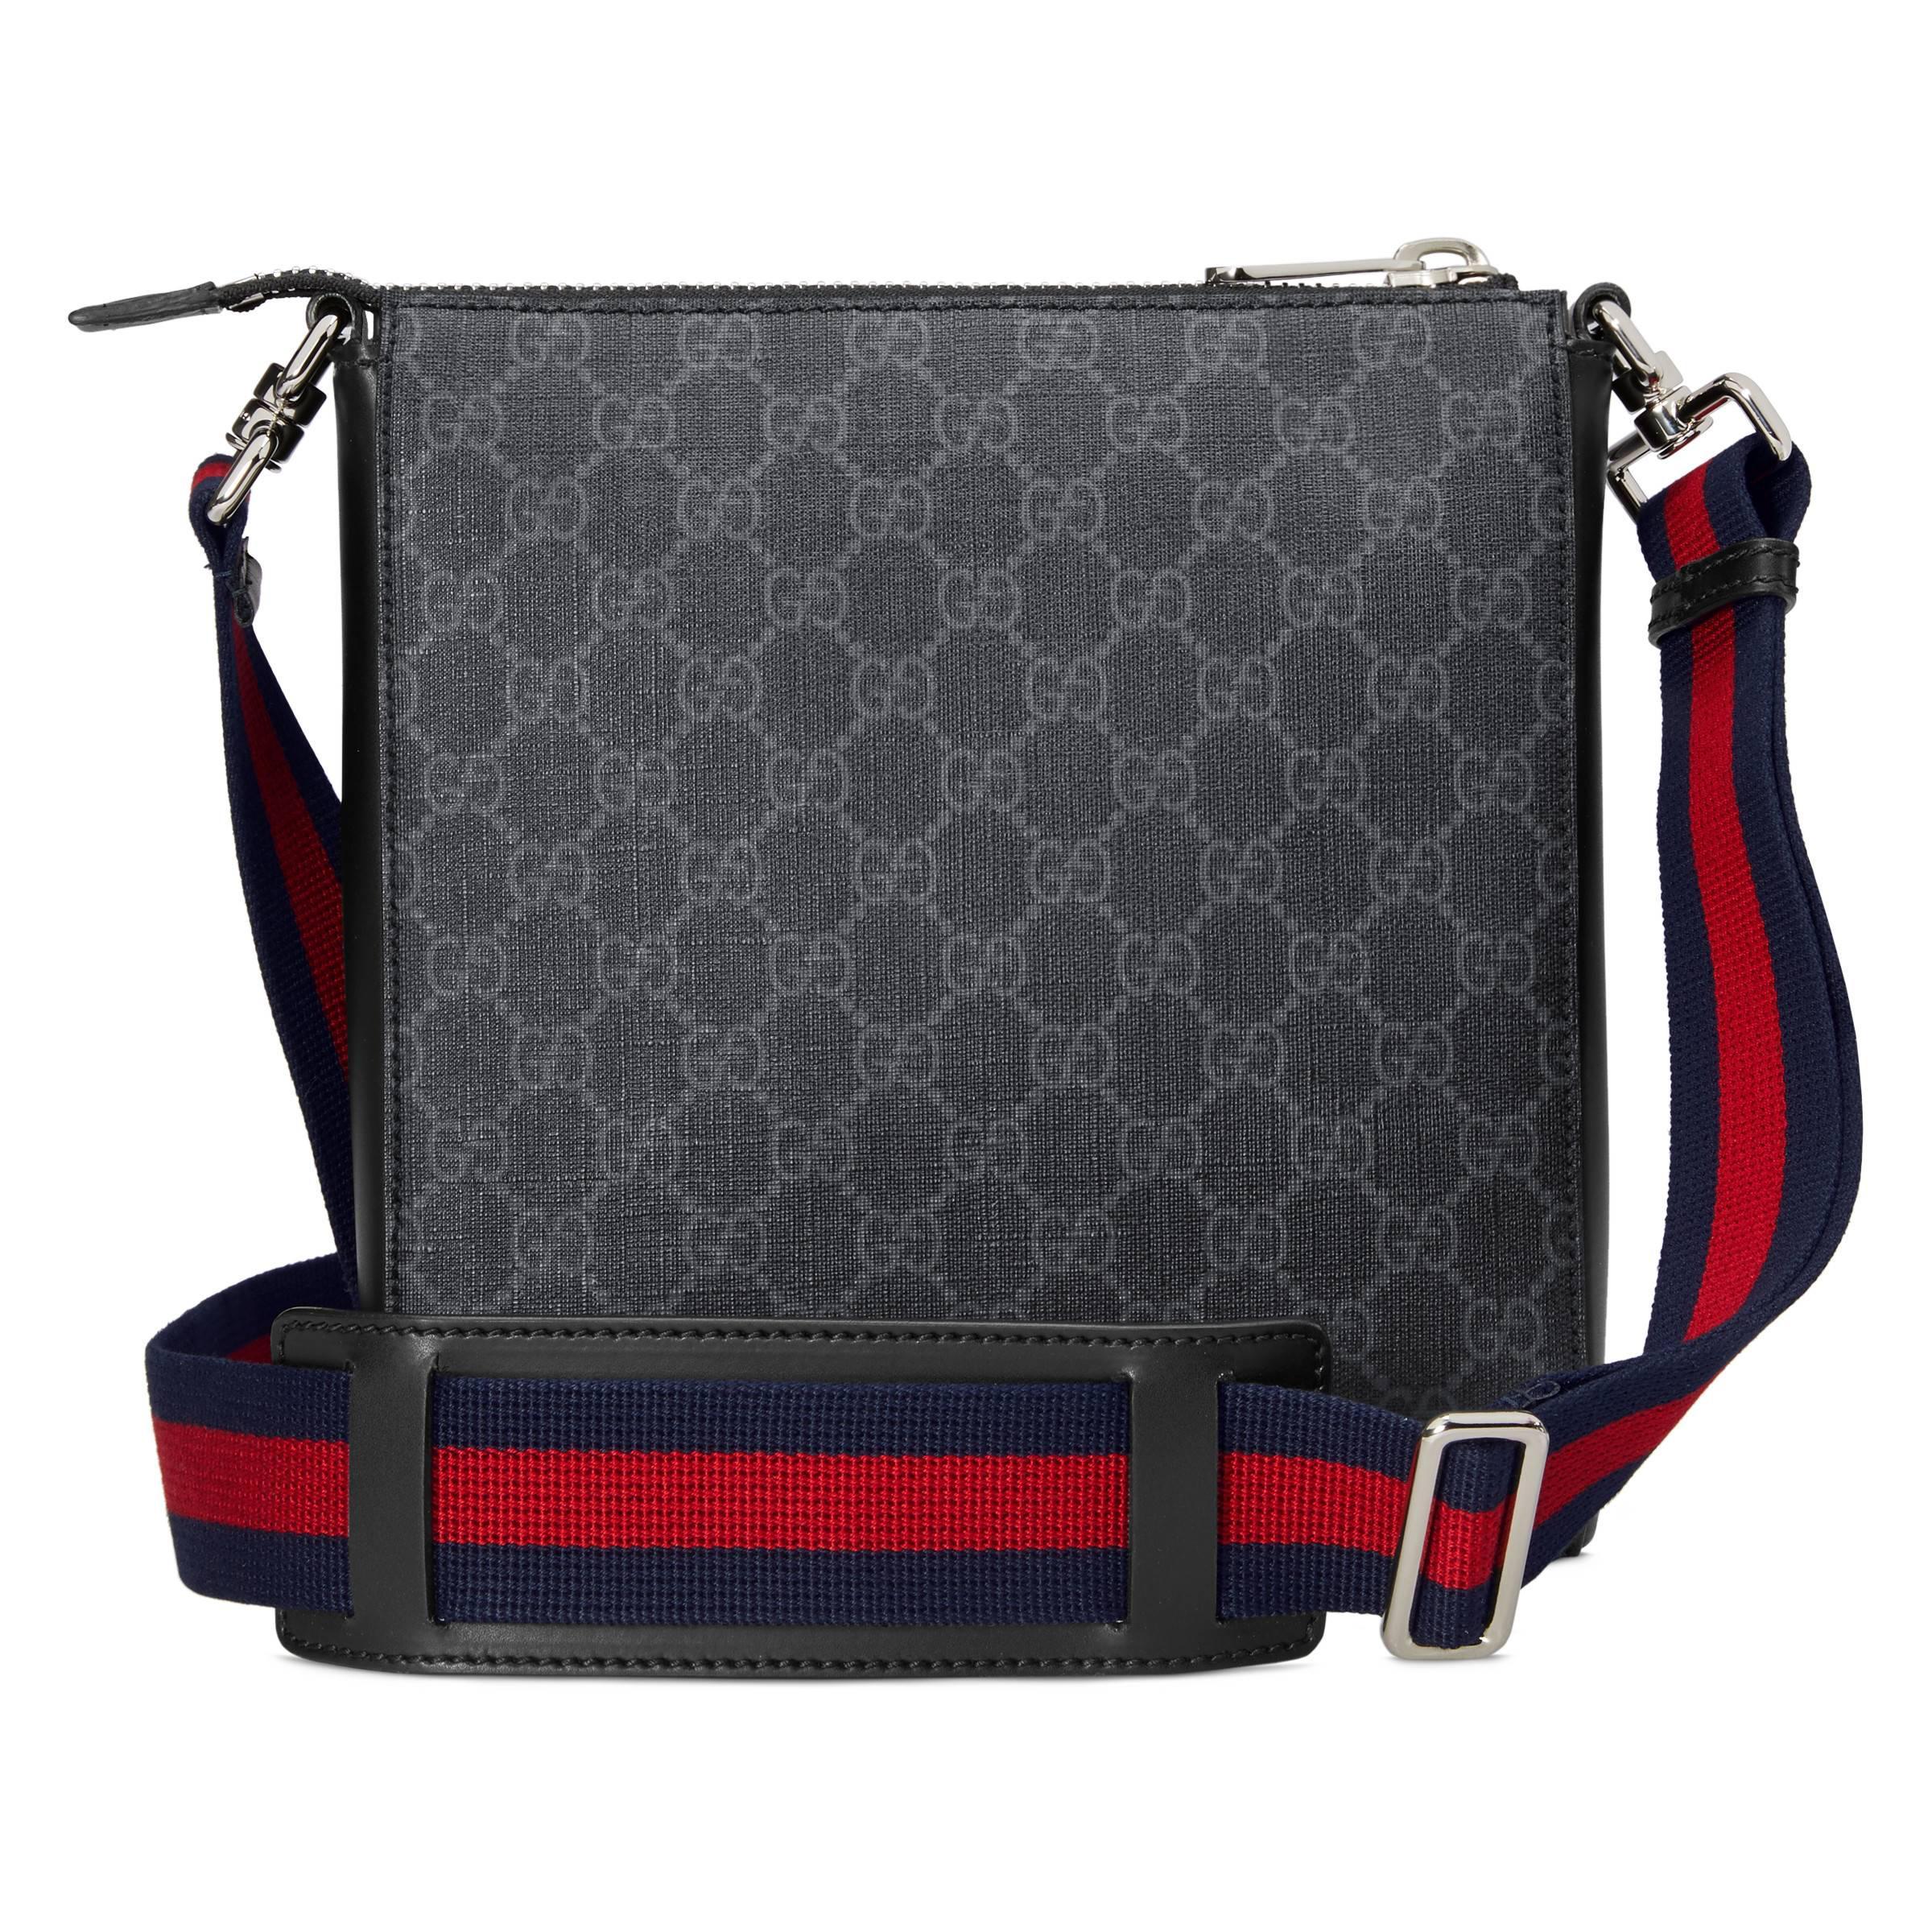 c4ed8fa3669 Gucci - Black GG Supreme Small Messenger Bag for Men - Lyst. View fullscreen